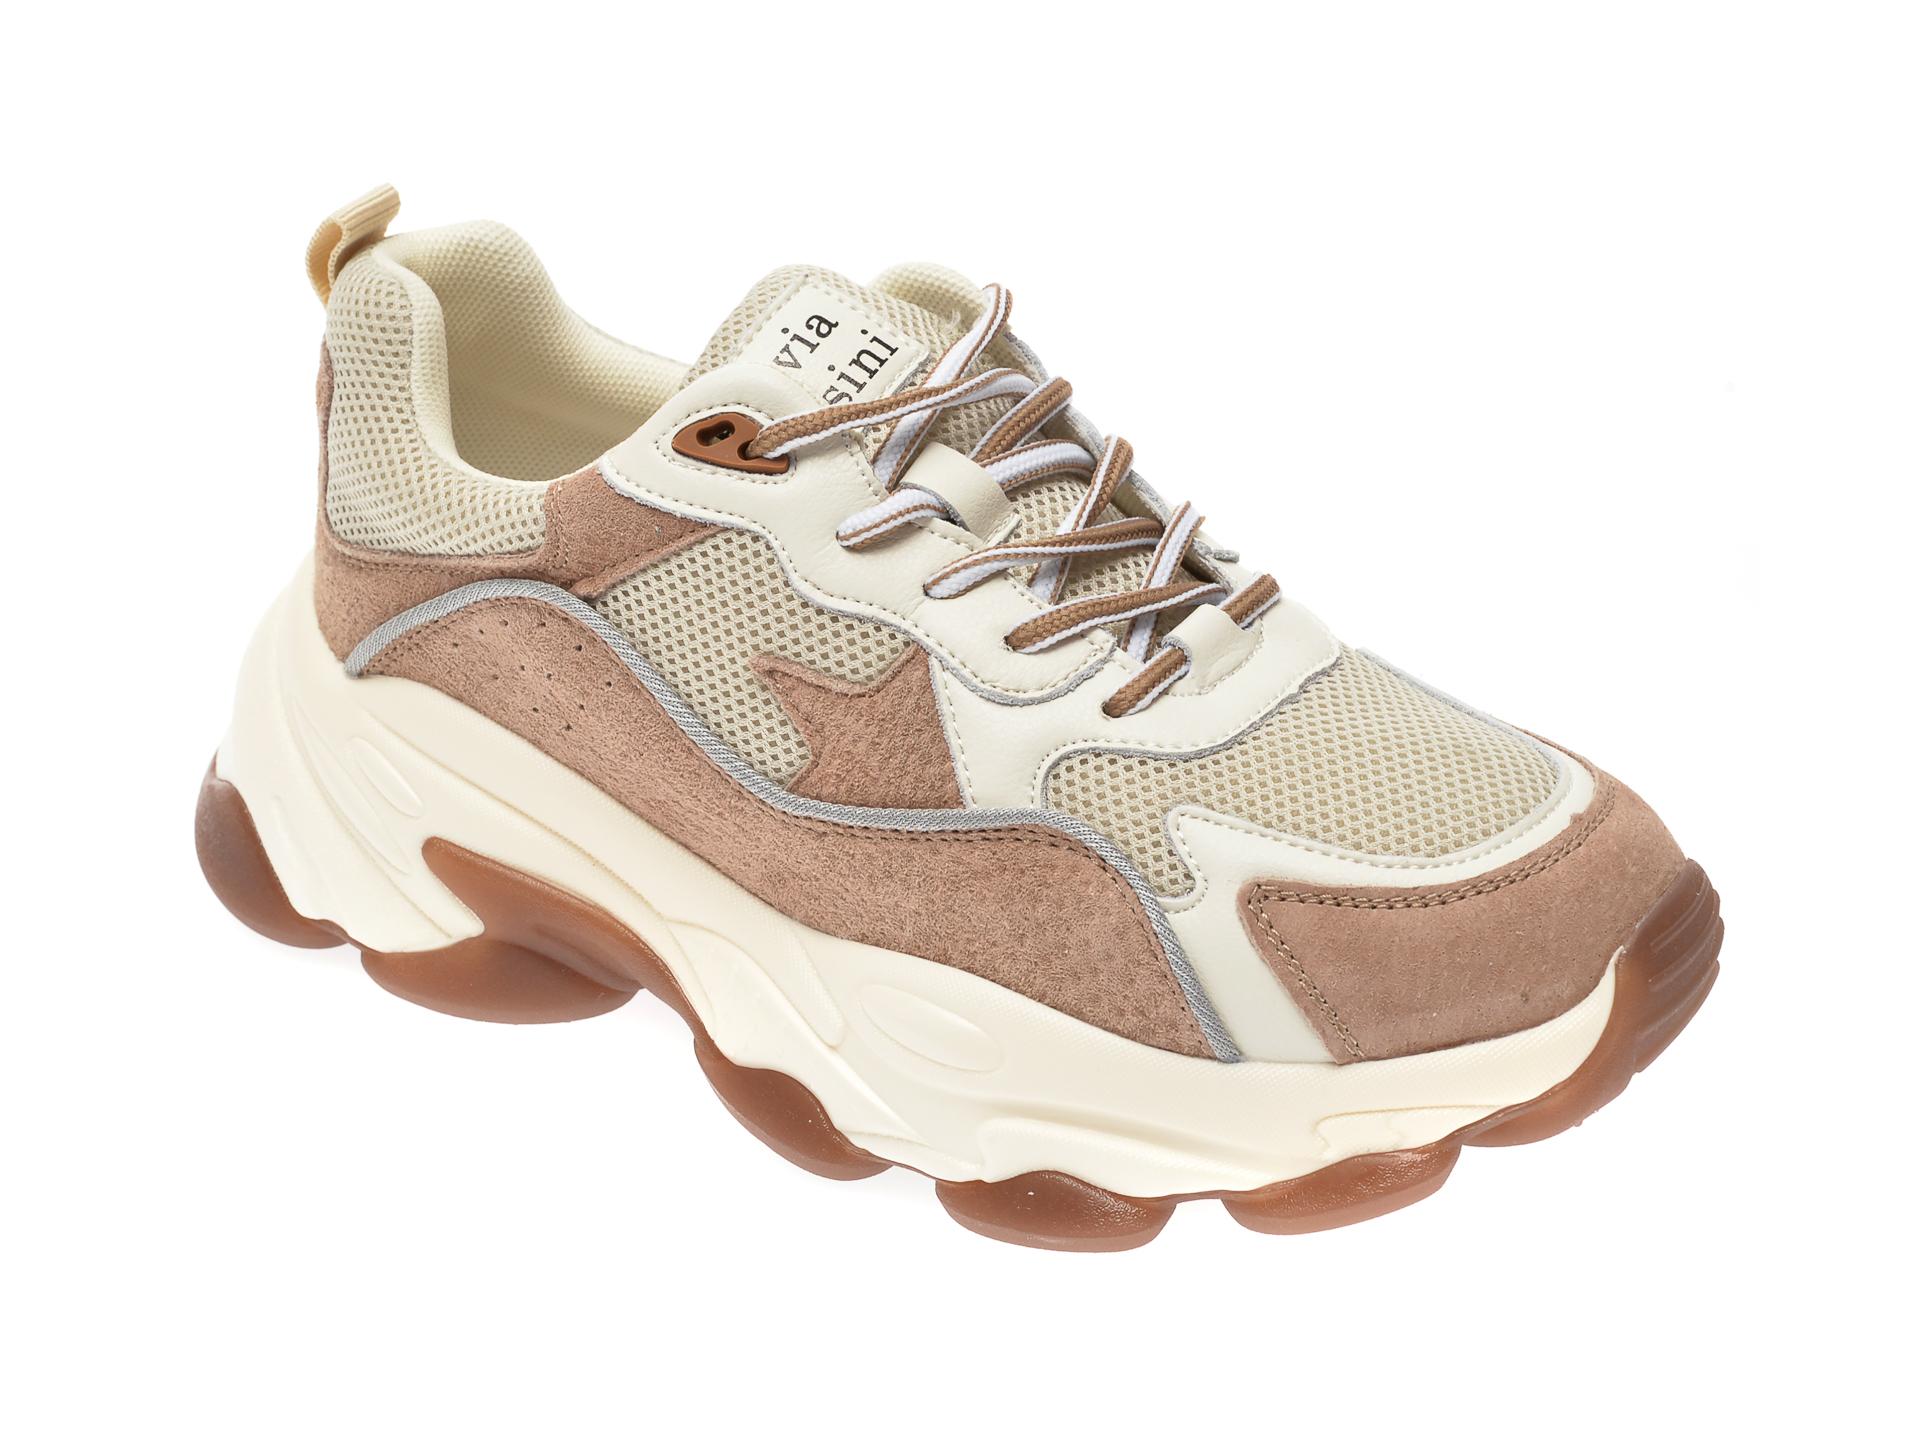 Pantofi sport FLAVIA PASSINI maro, YC19837, din material textil si piele naturala imagine